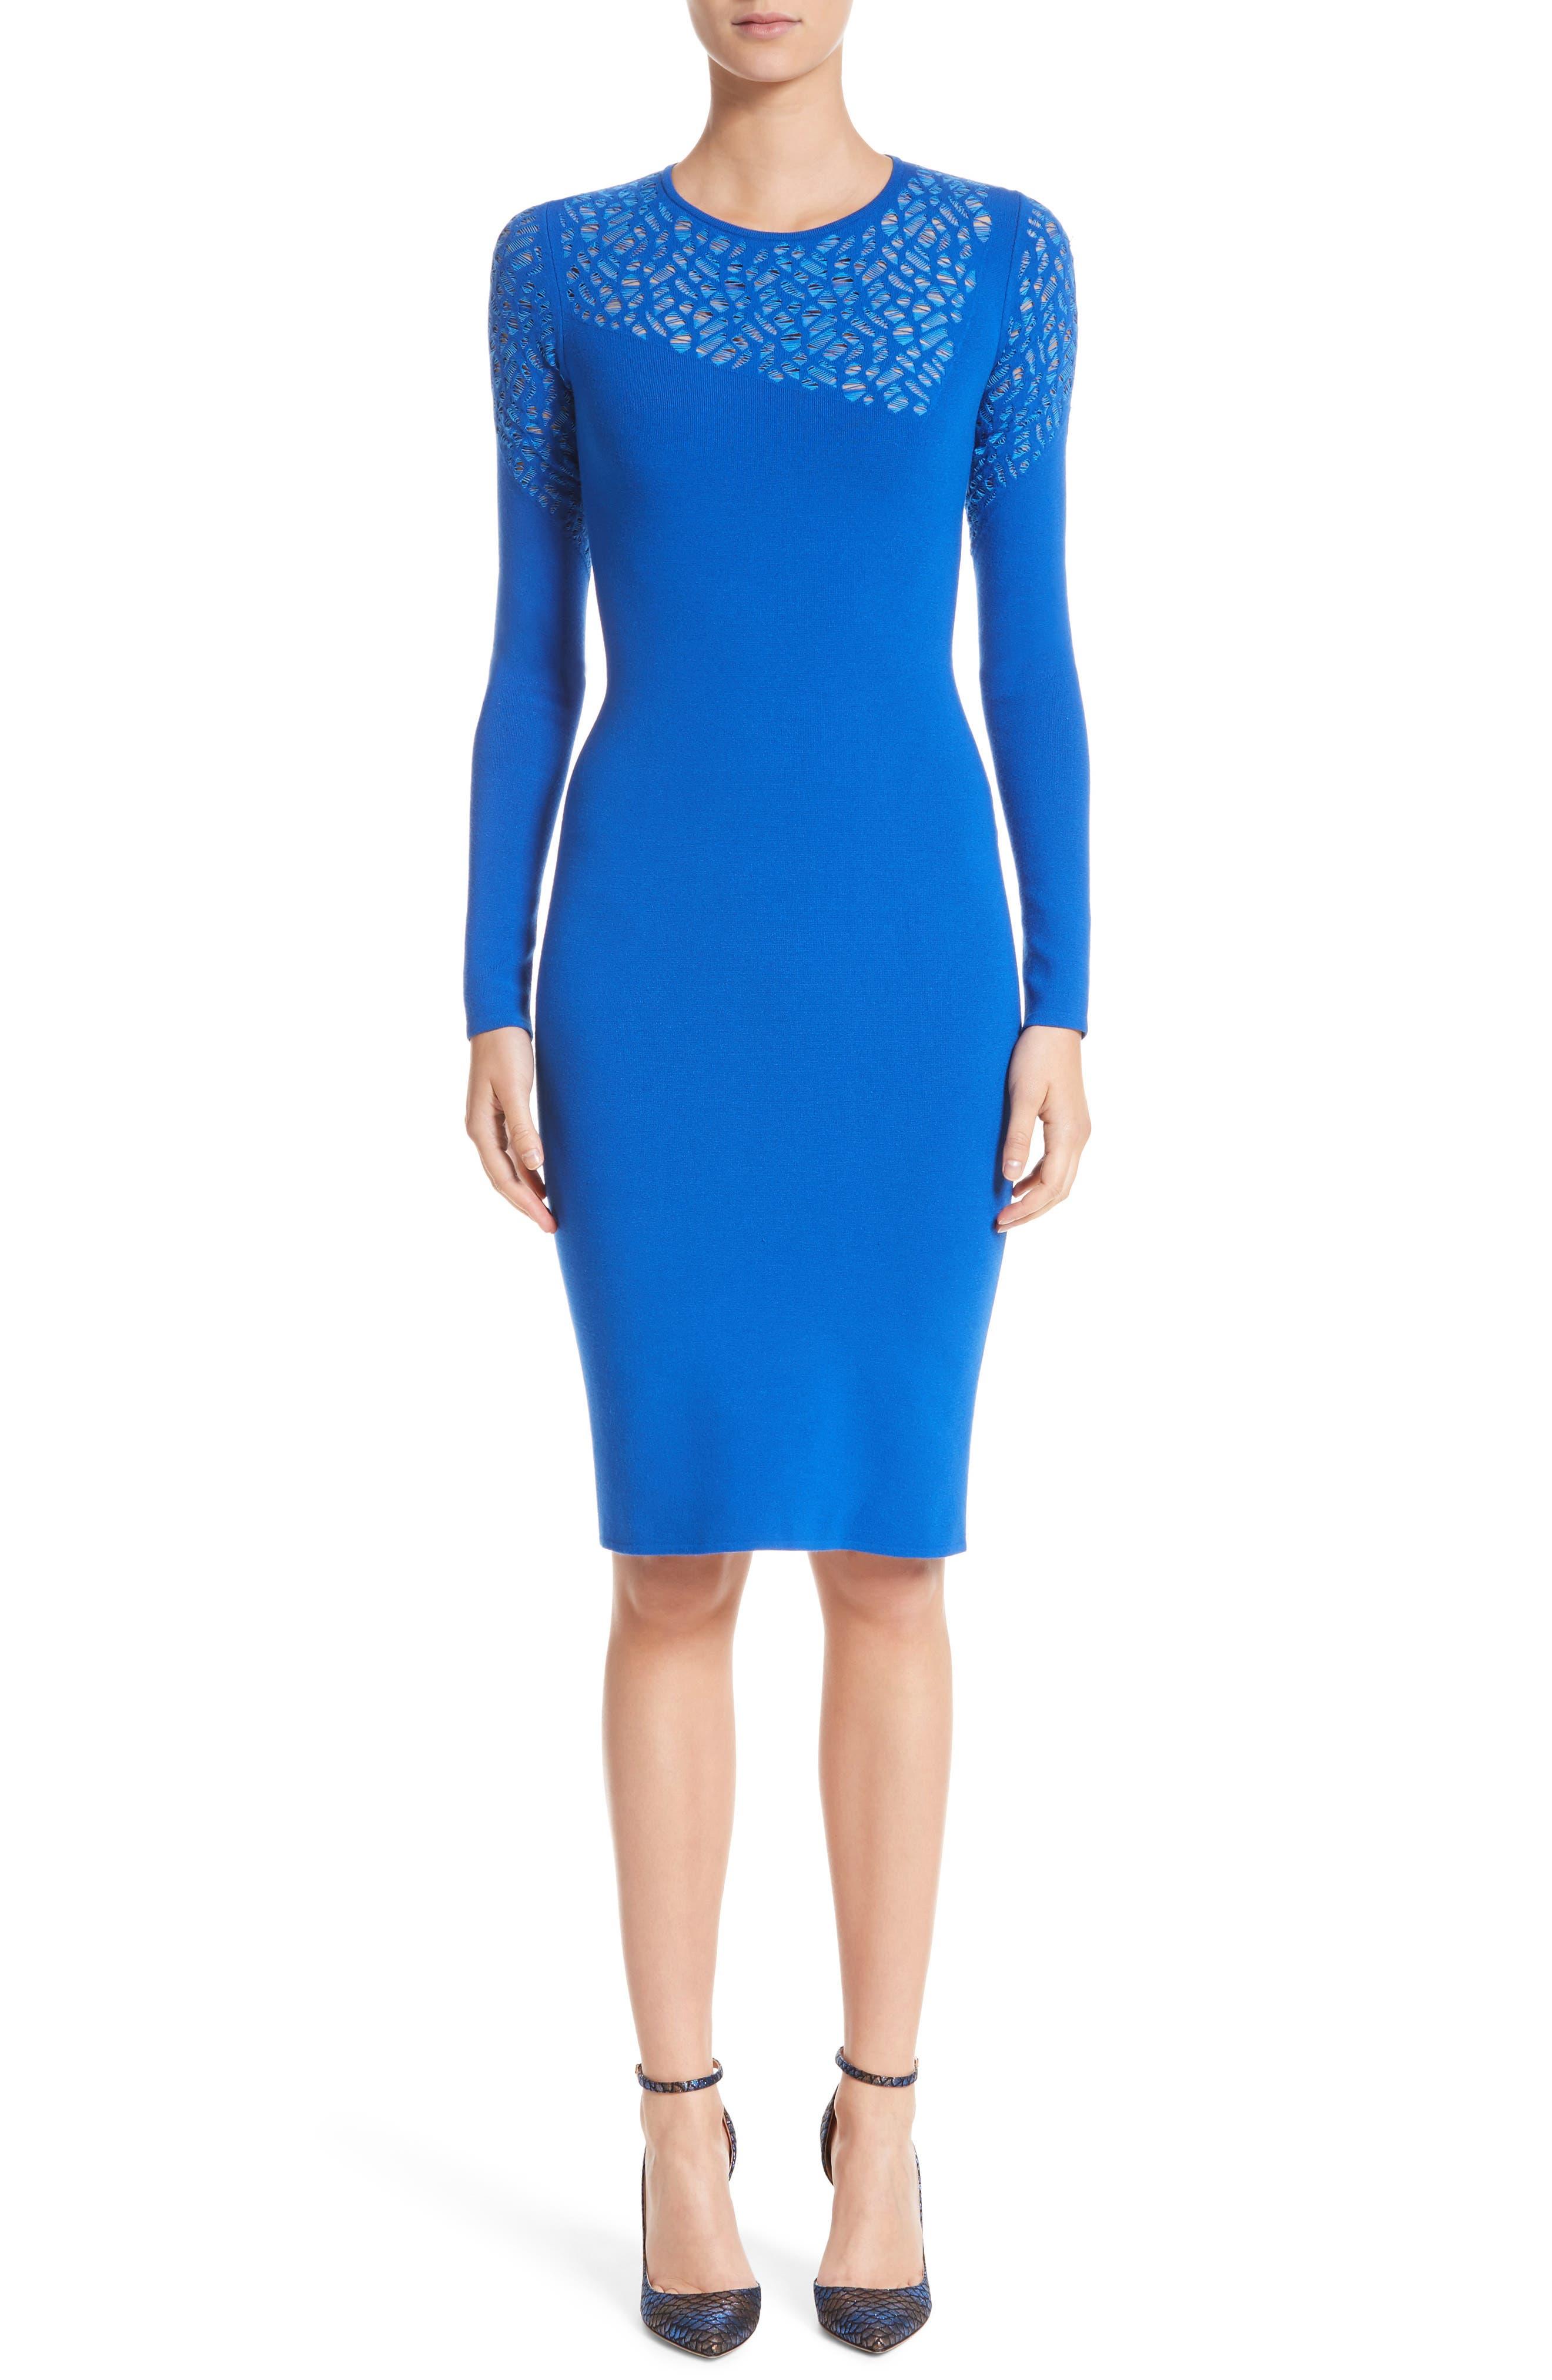 Contrast Stitch Knit Dress,                         Main,                         color, Royal Blue/ Light Blue